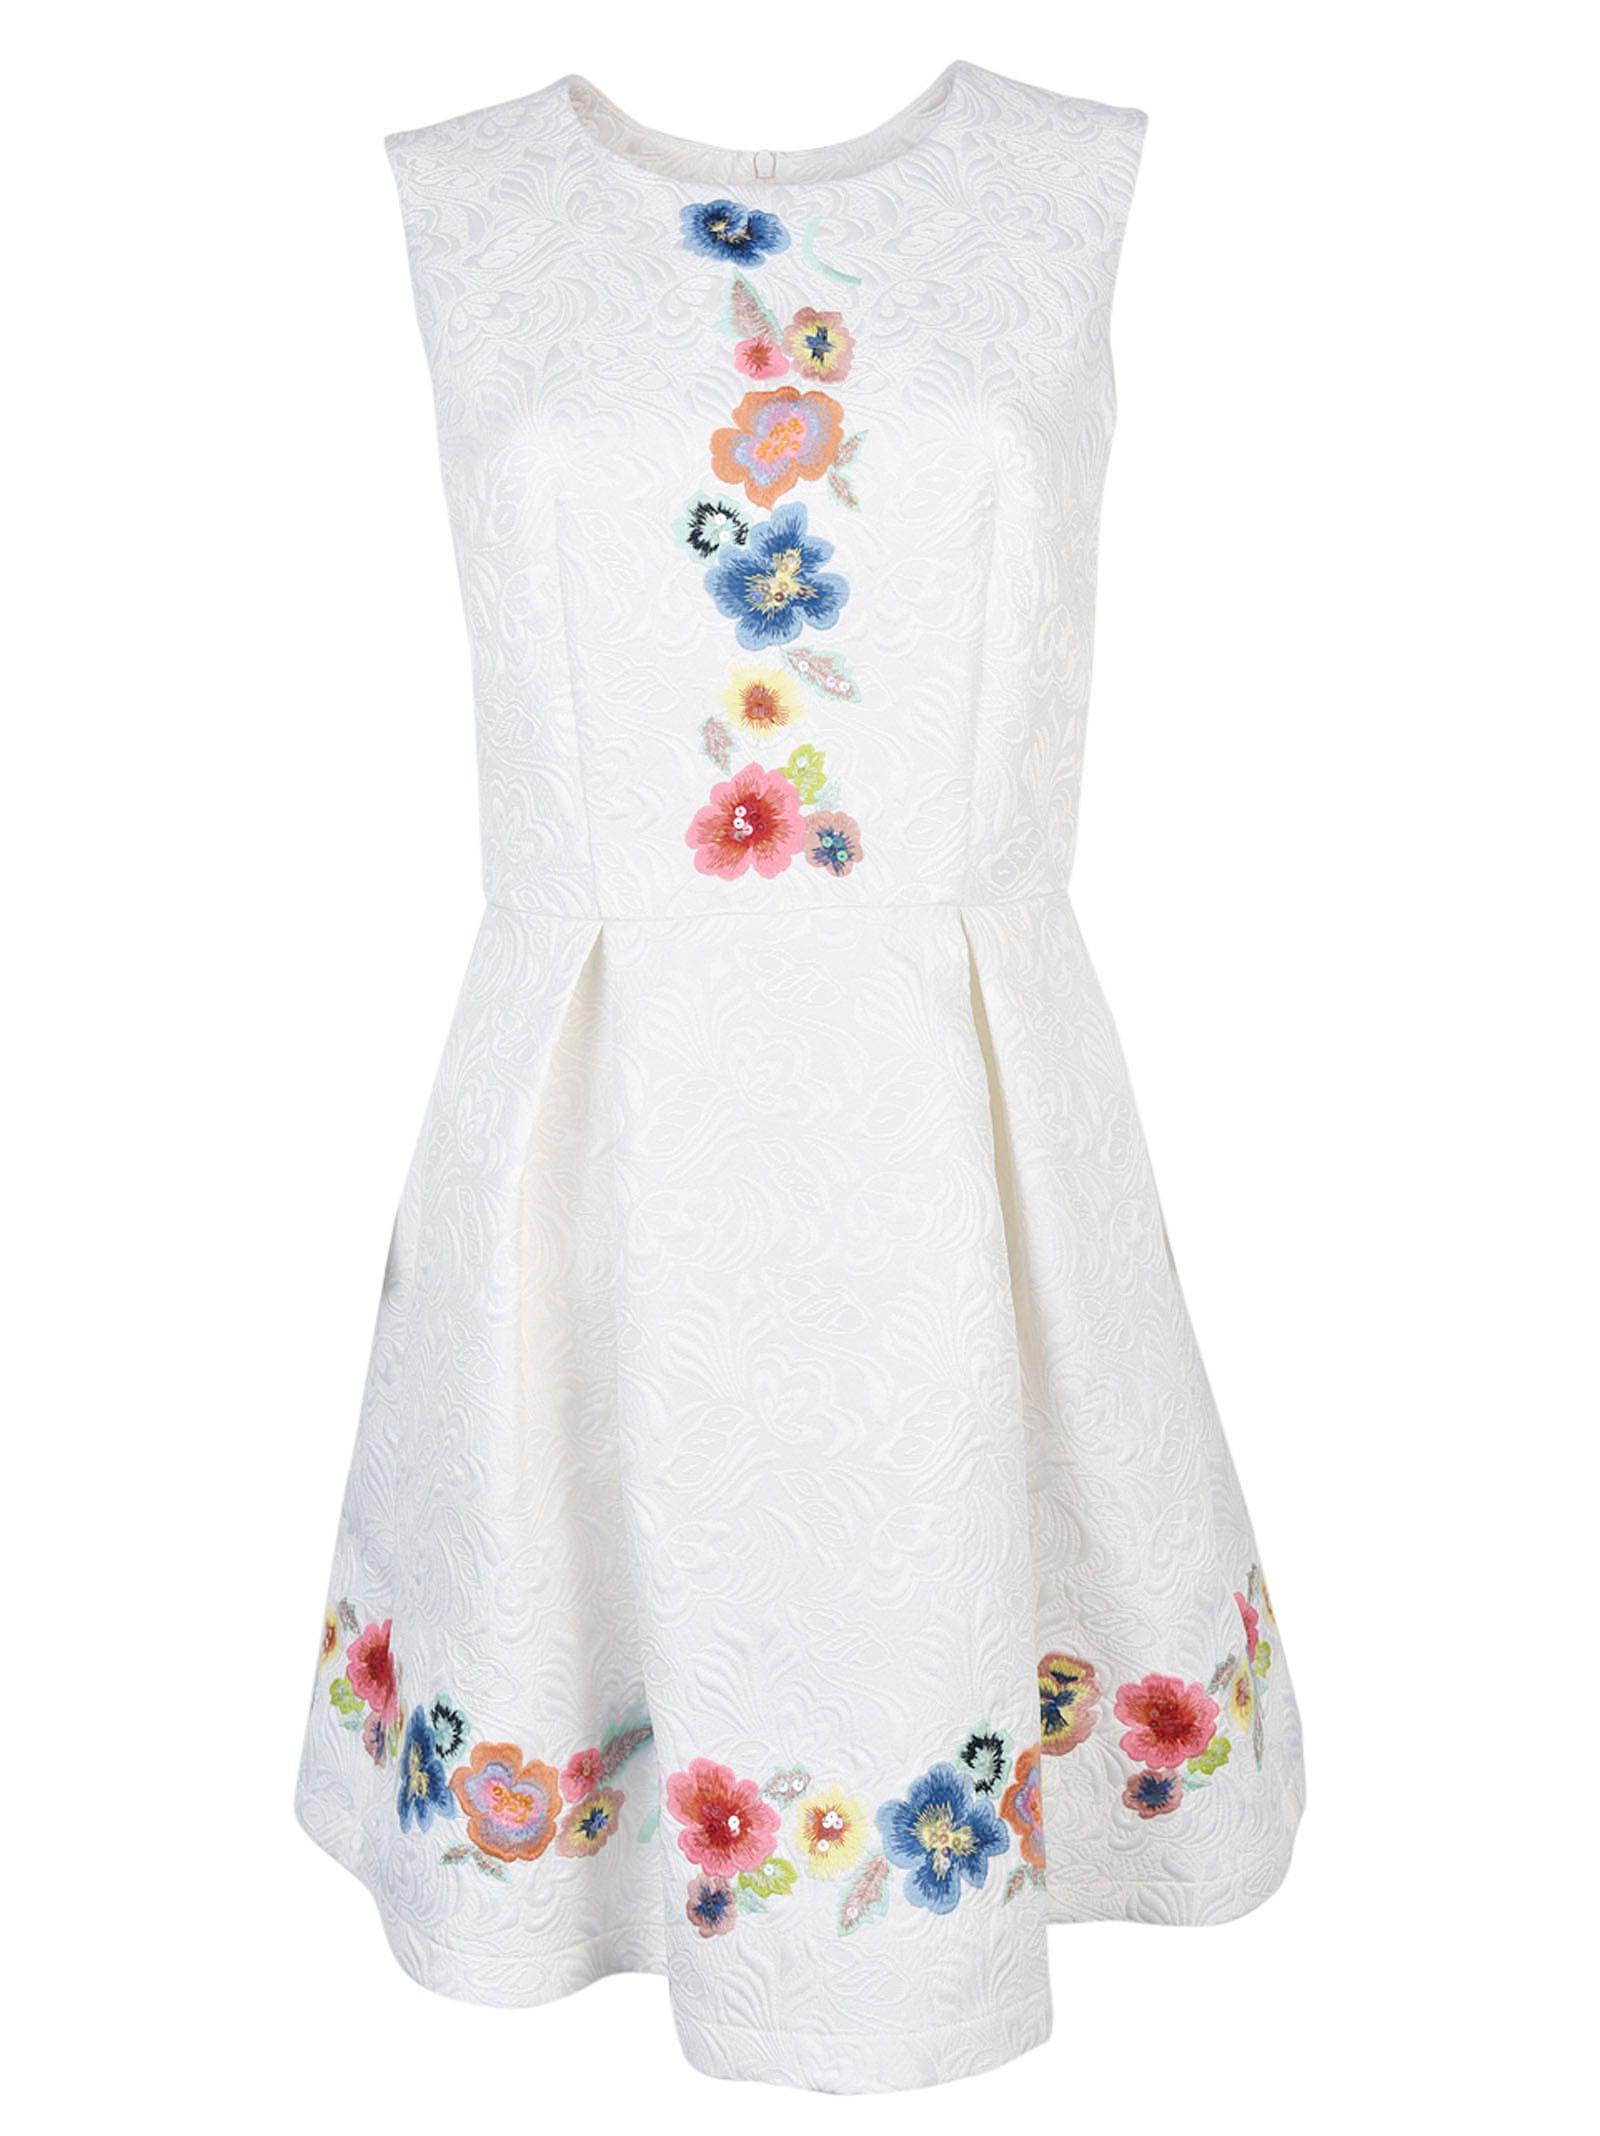 Blugirl Embroidered Floral Dress